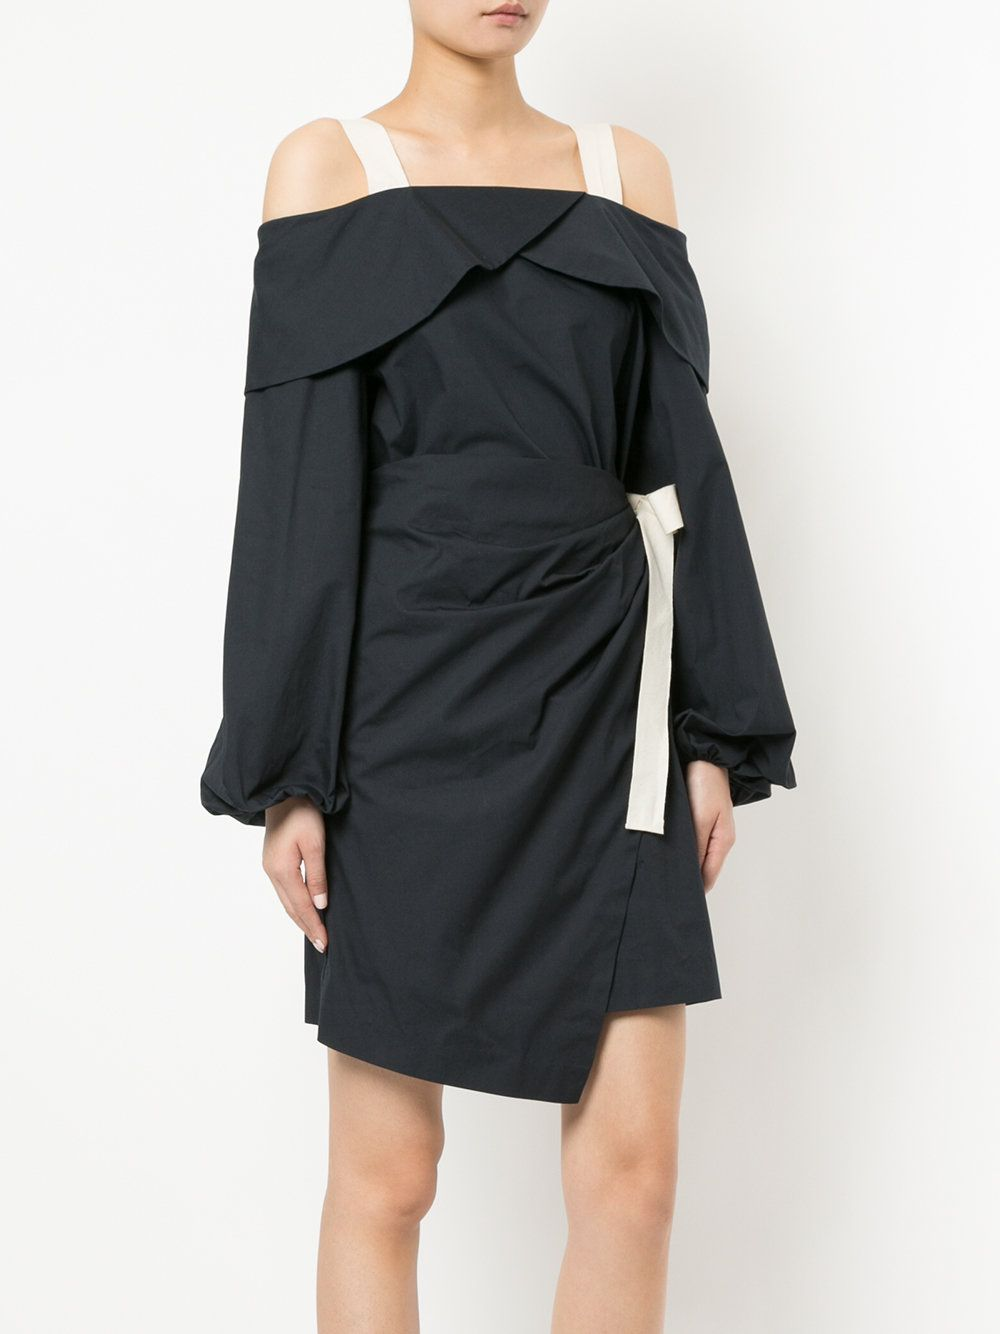 Goen.J off-the-shoulder wrap dress New Arrival Online GVCmAw